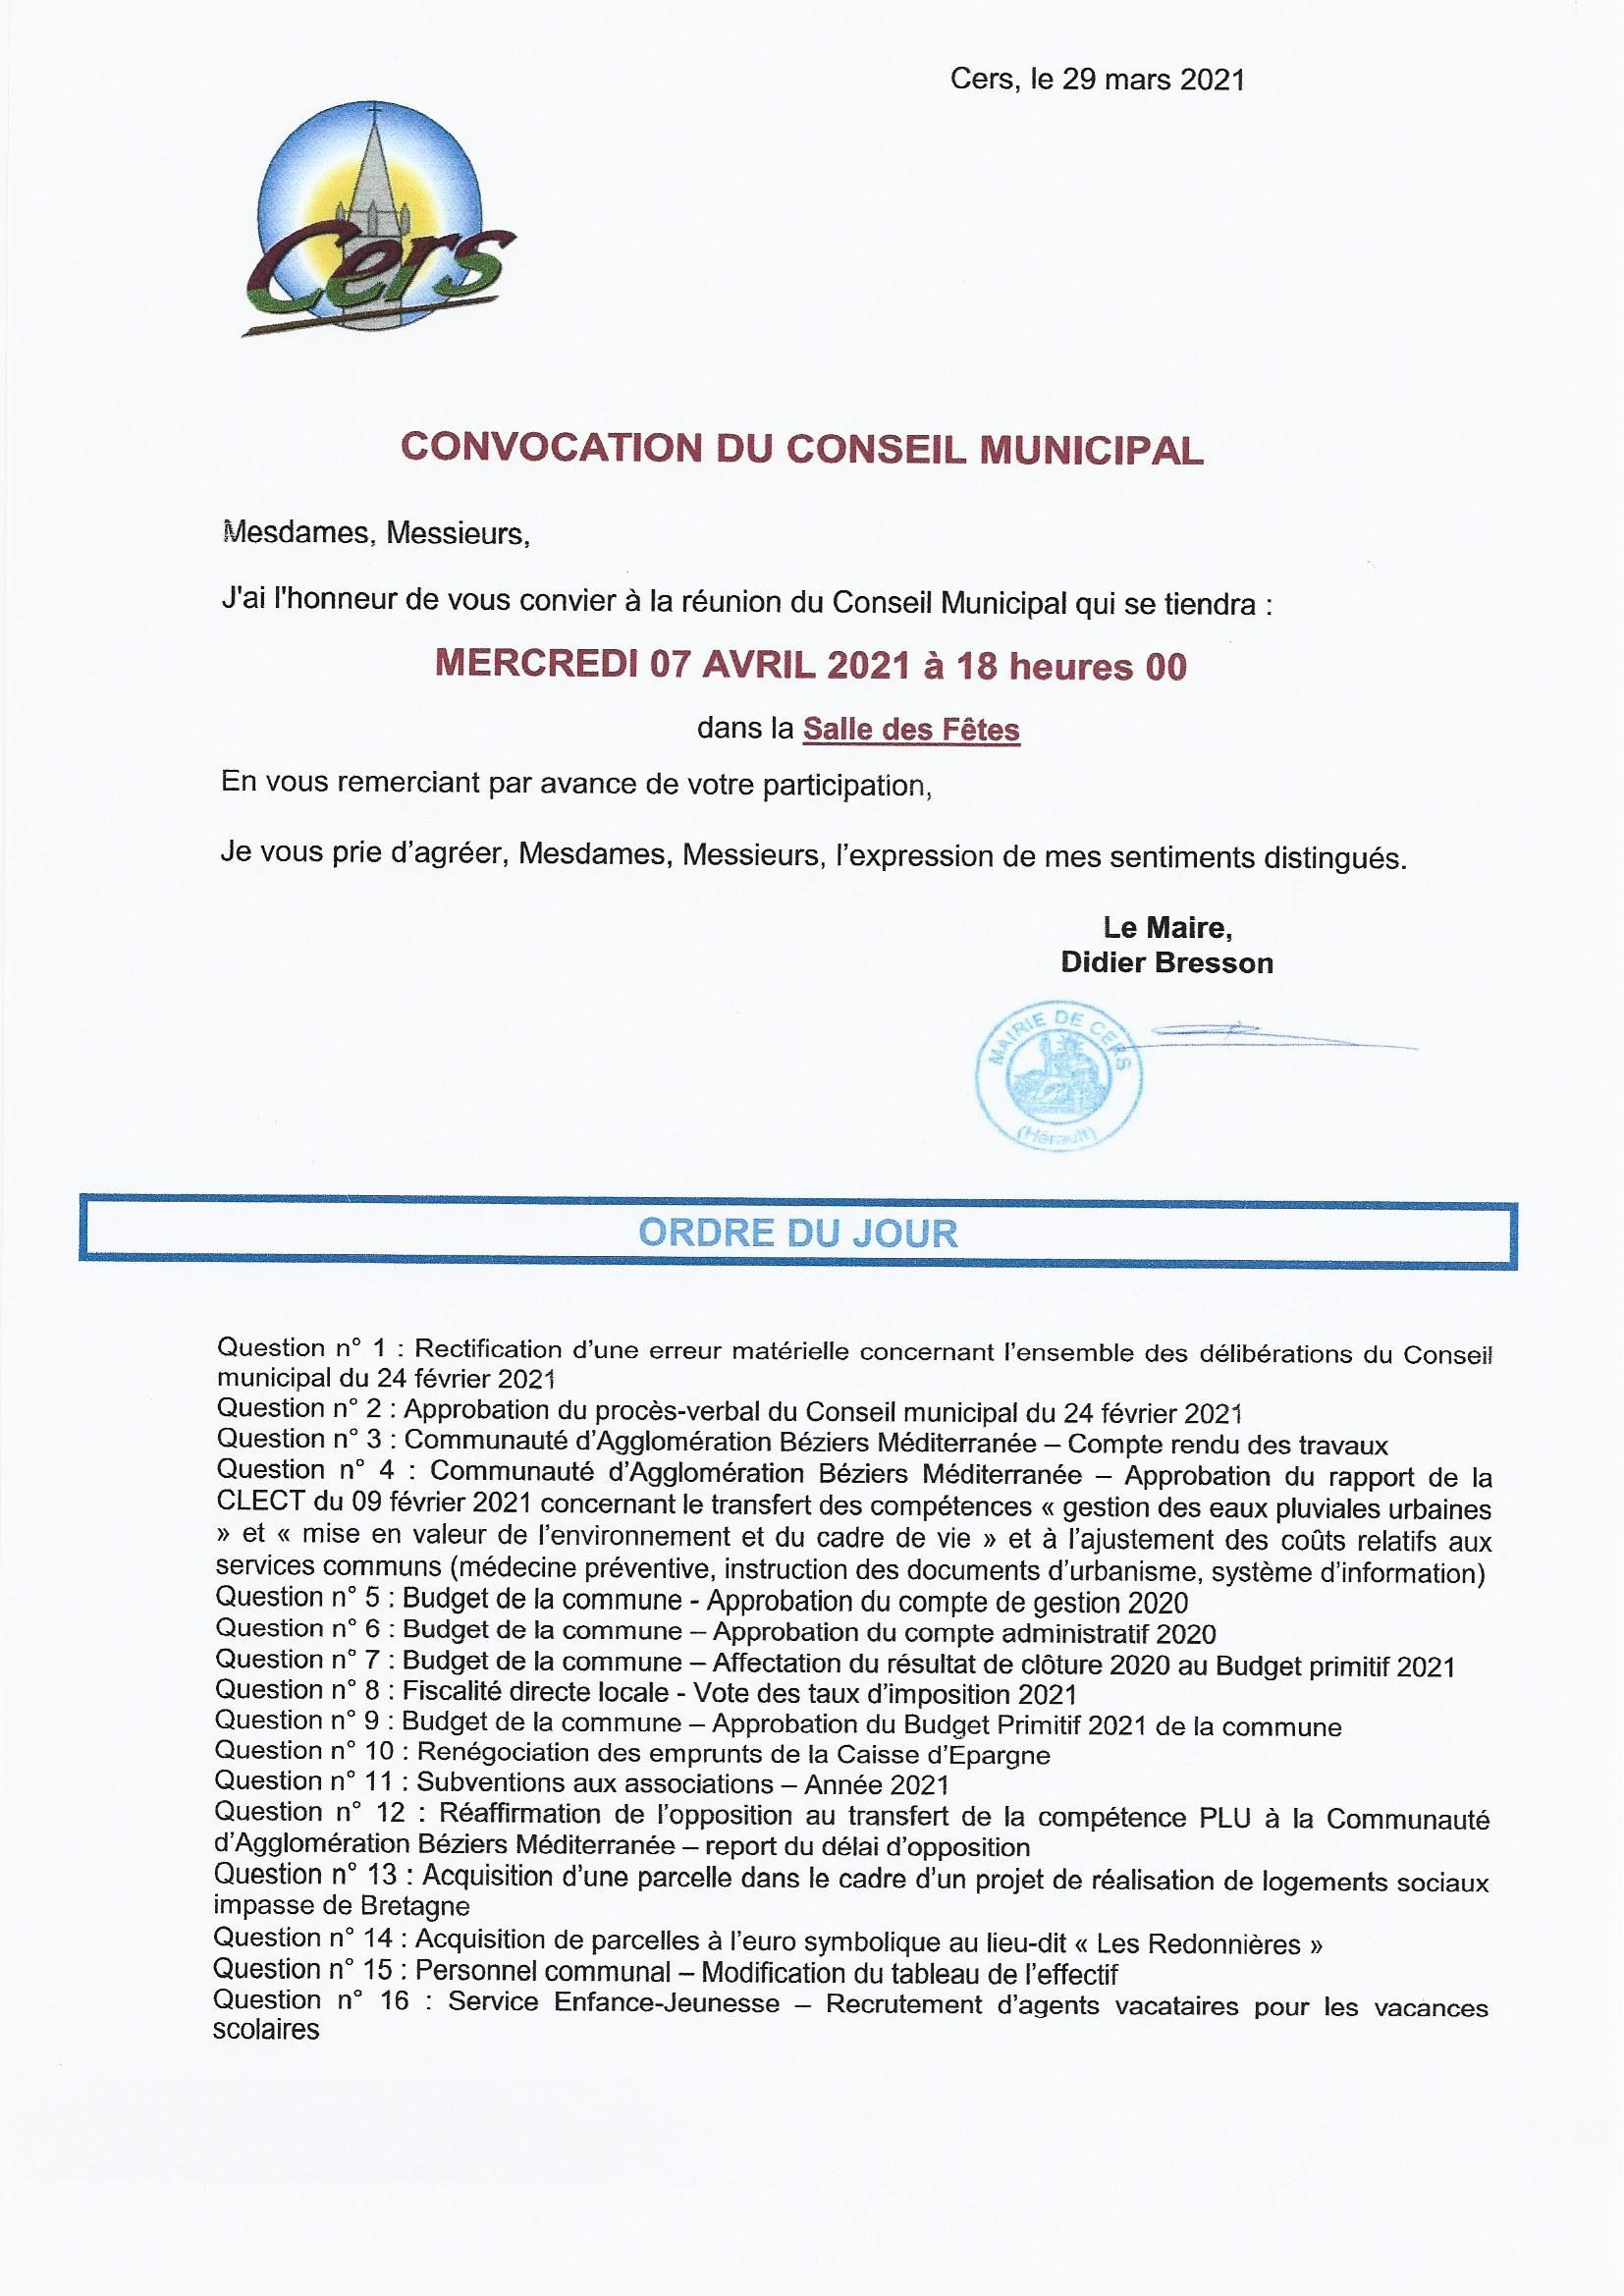 PROCHAIN CONSEIL MUNICIPAL : mercredi 7 avril 2021